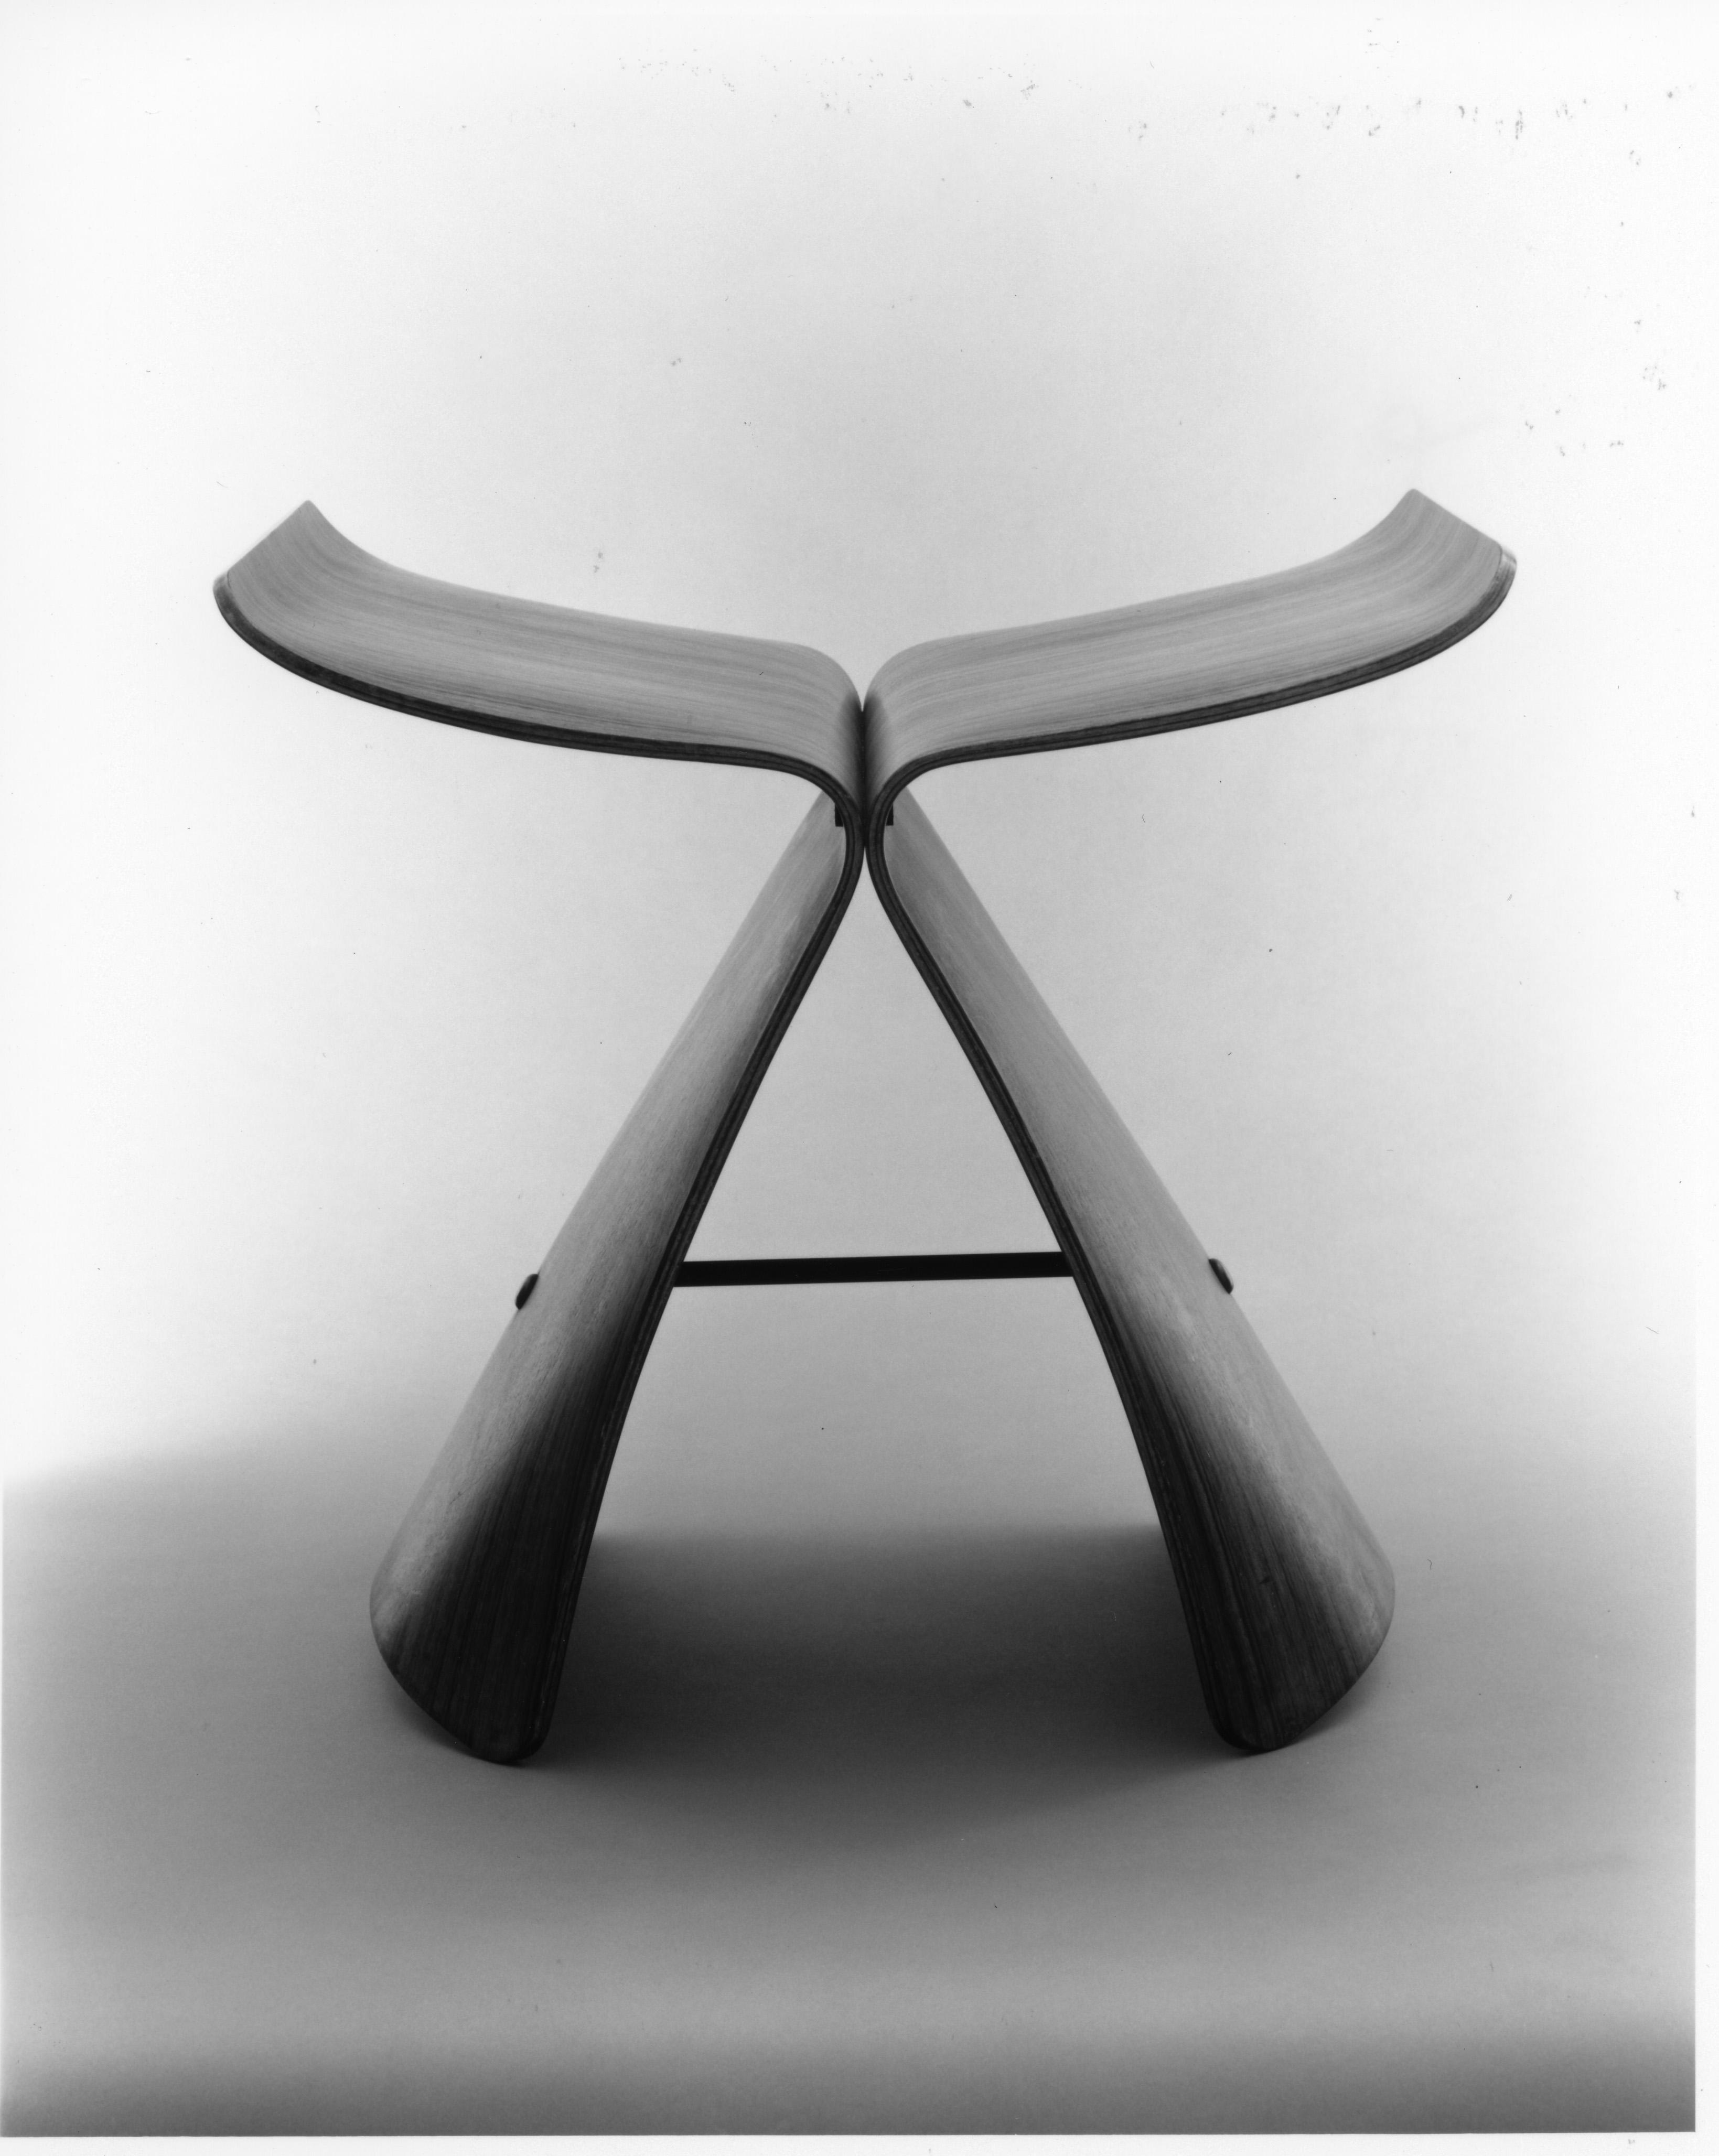 liuzongli-design-hisheji (7)